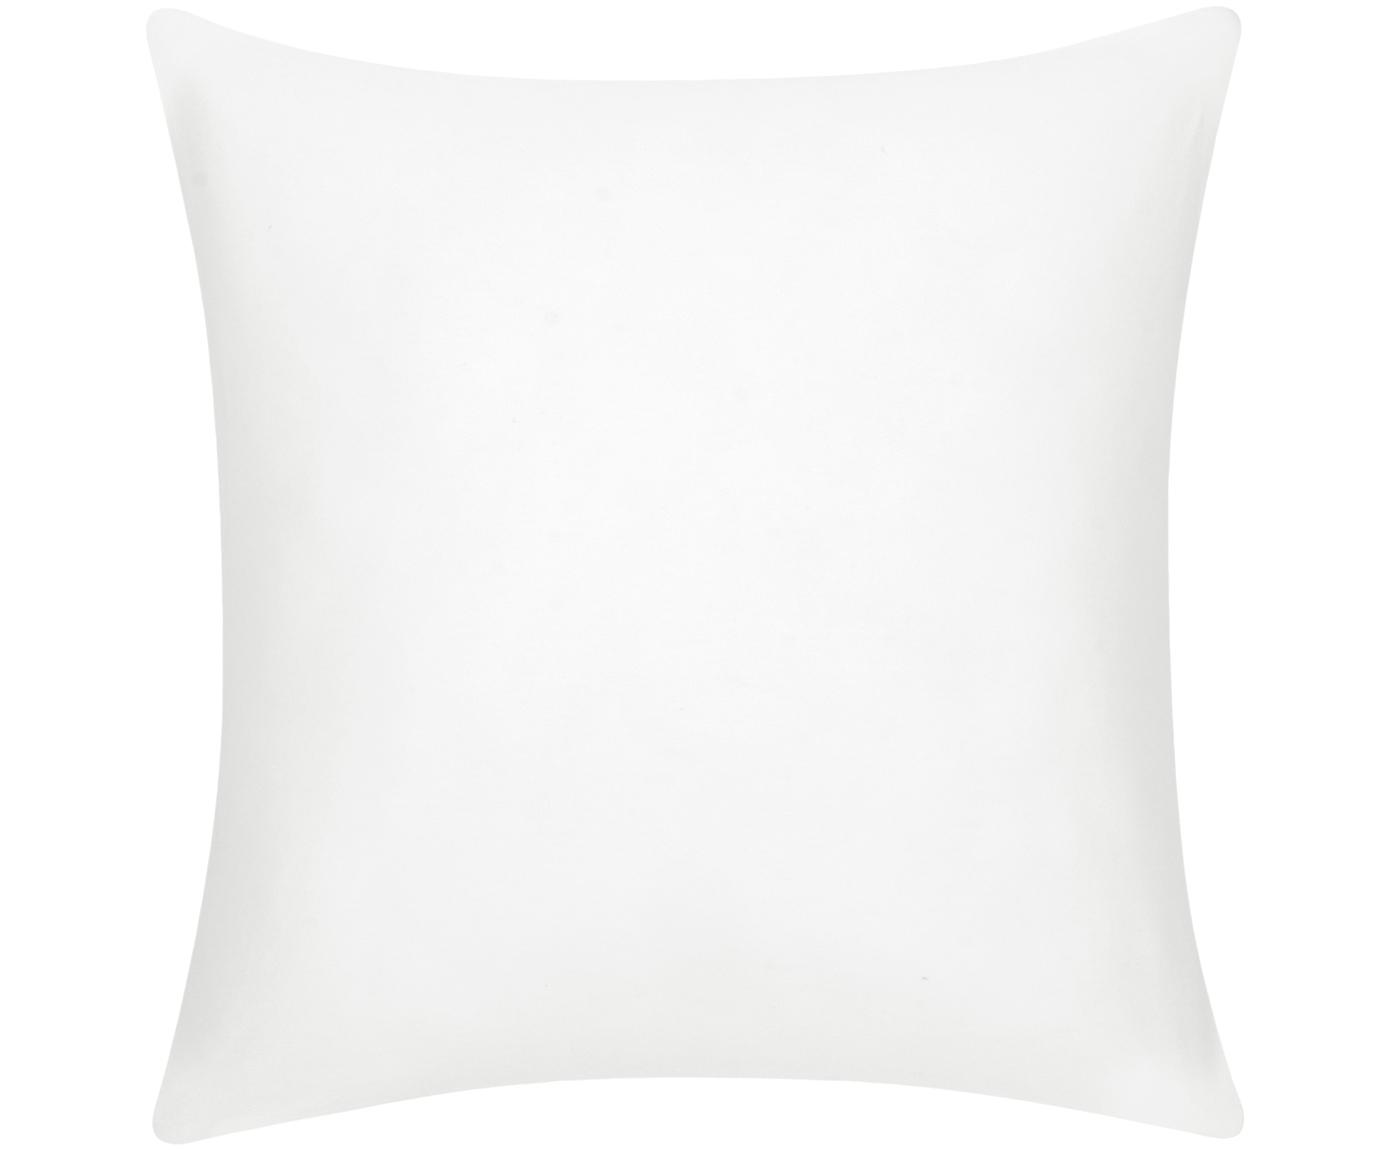 Federa arredo in bianco Mads, Cotone, Bianco, Larg. 40 x Lung. 40 cm